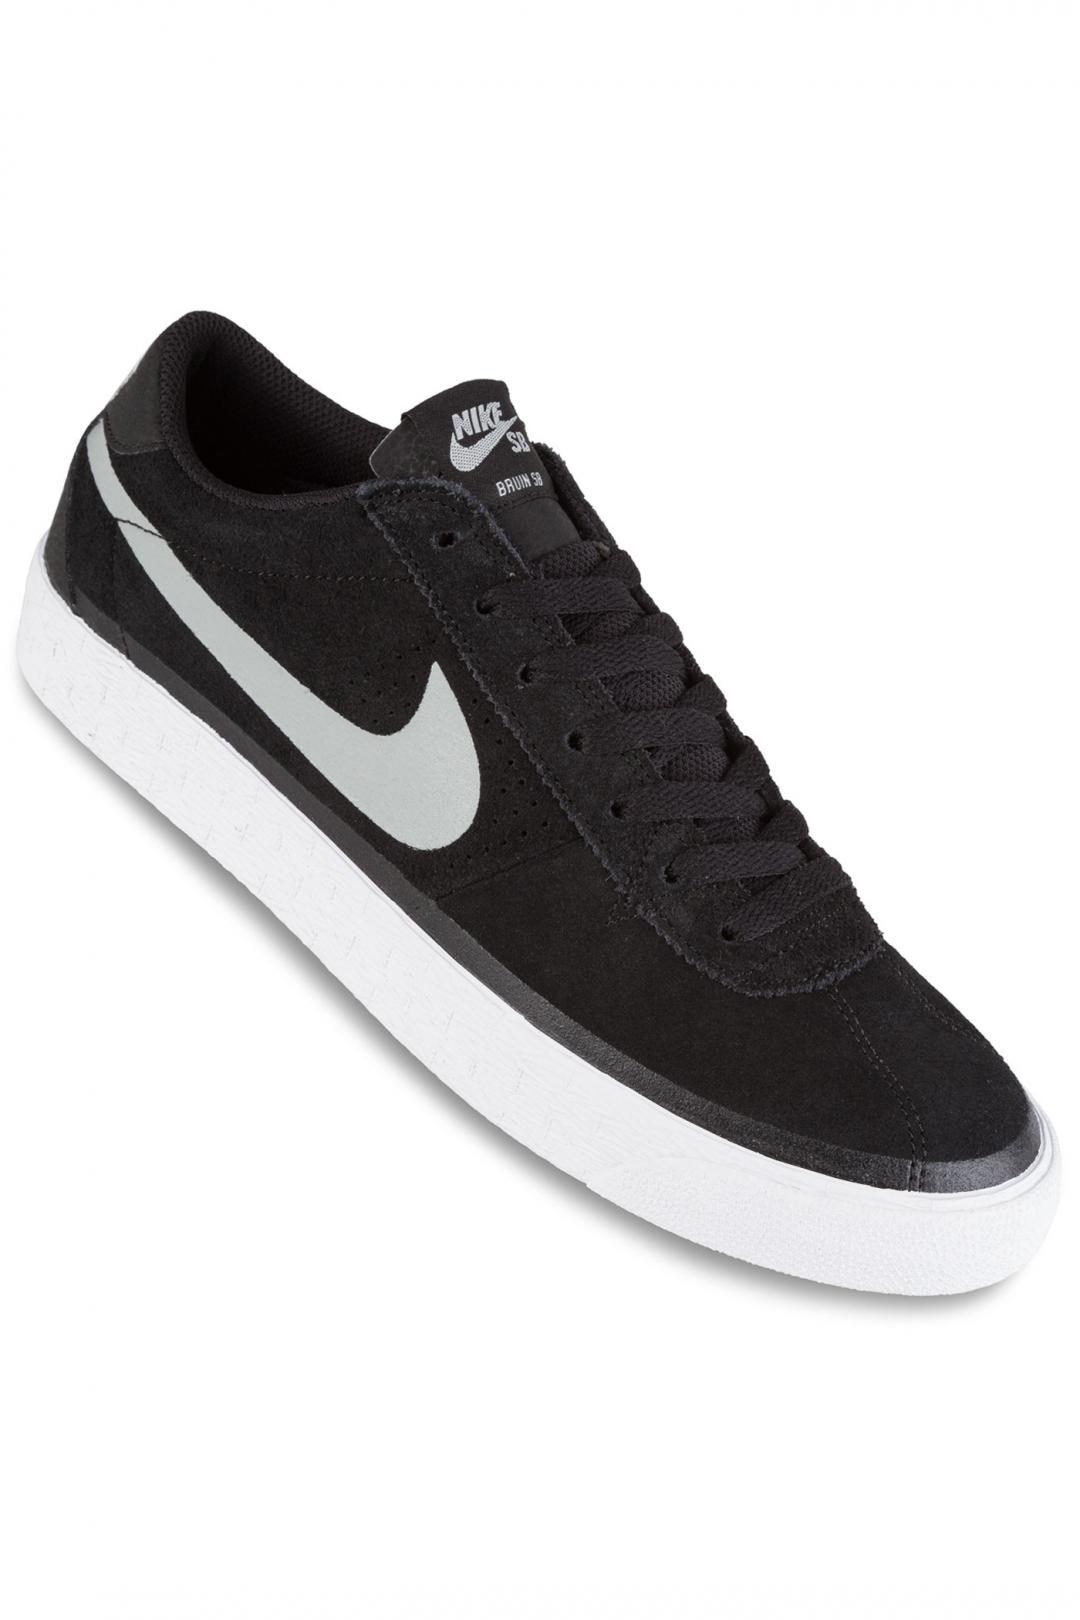 Uomo/Donna Nike SB Bruin Premium black base grey | Sneakers low top